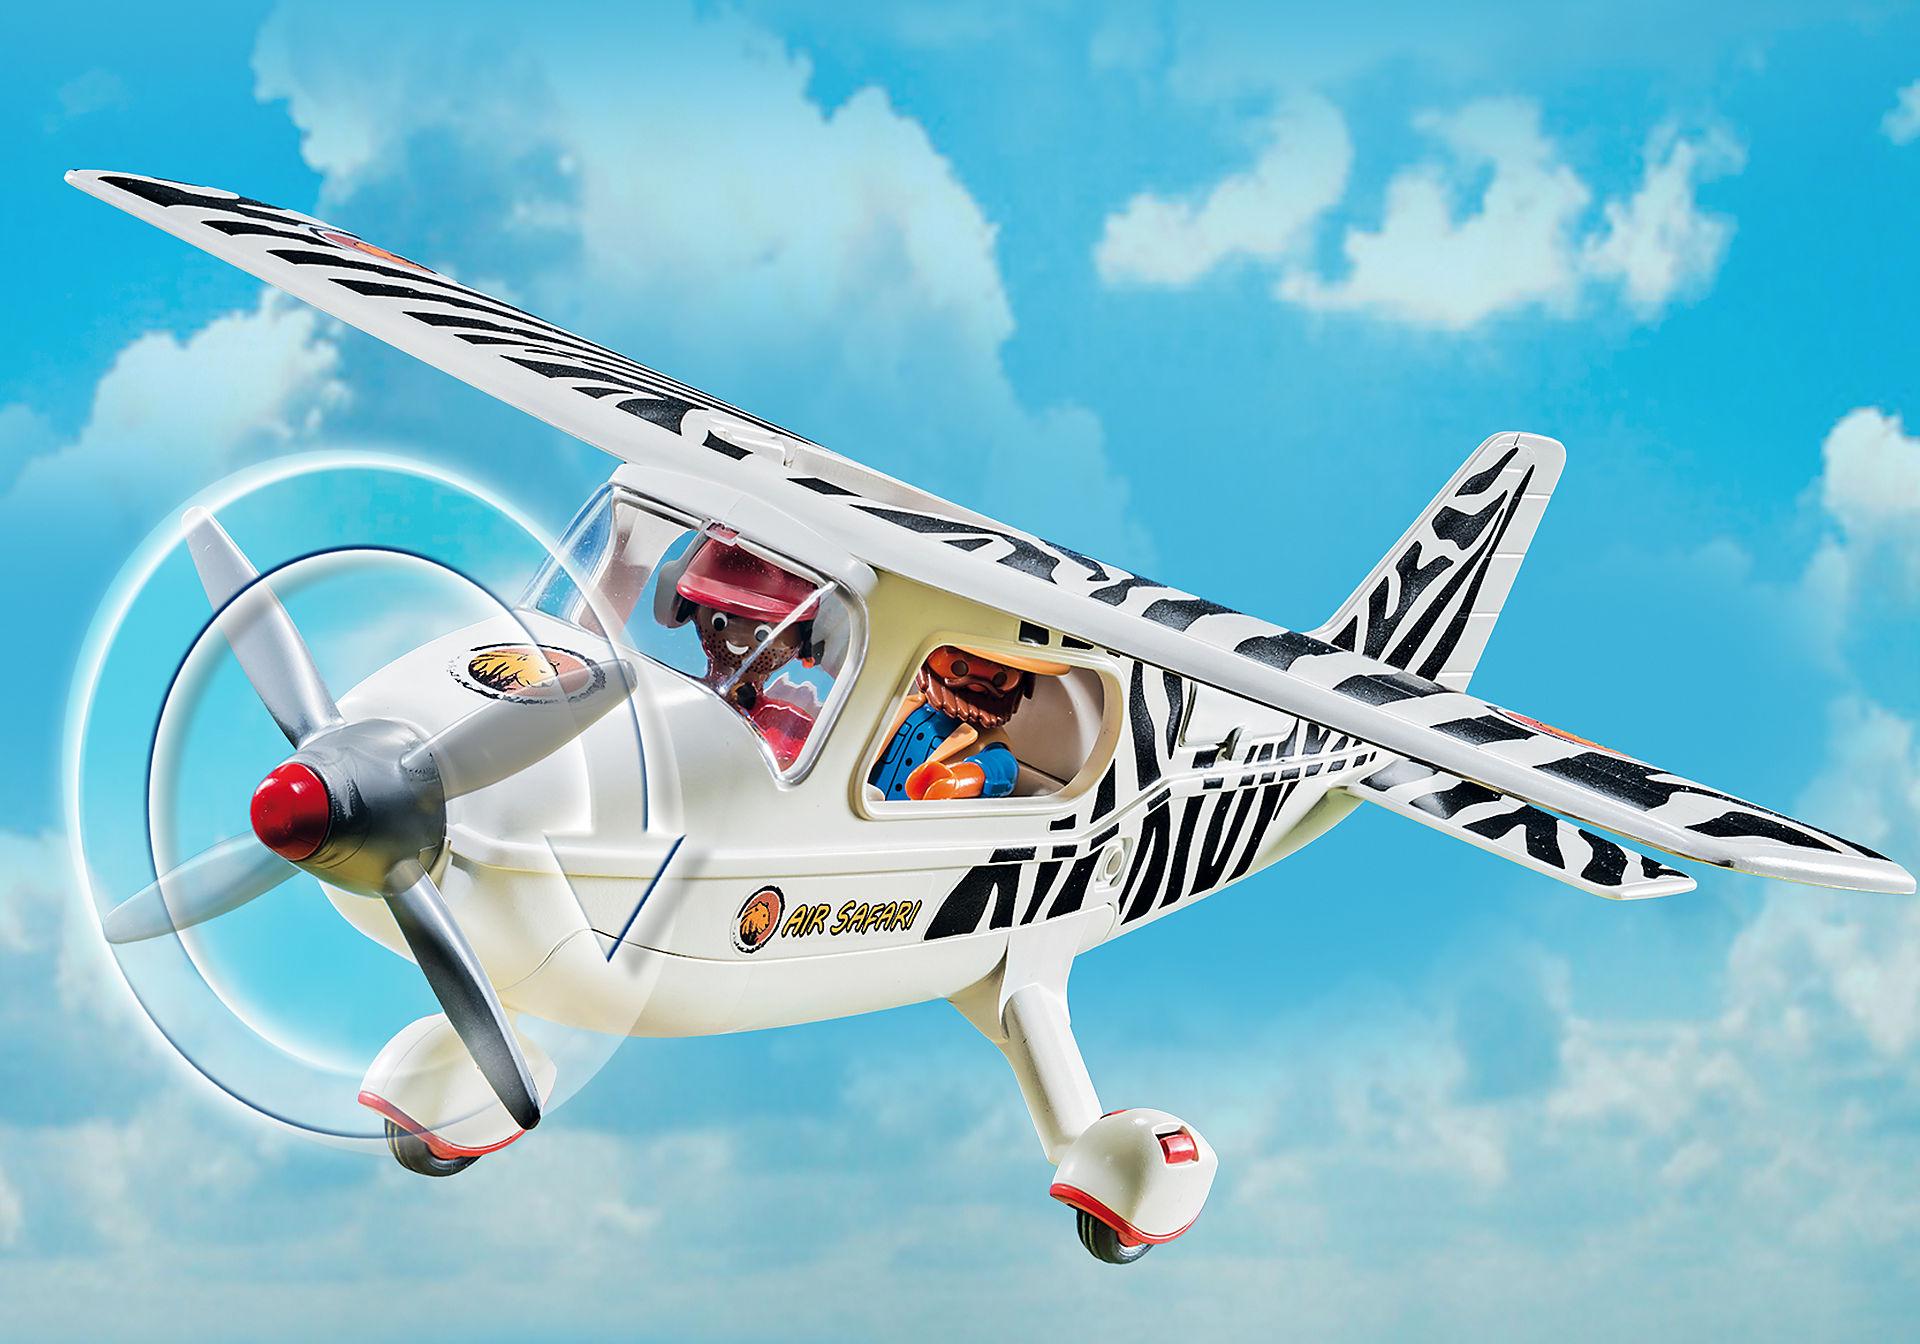 6938 Aereo di avvistamento fly-safari zoom image6